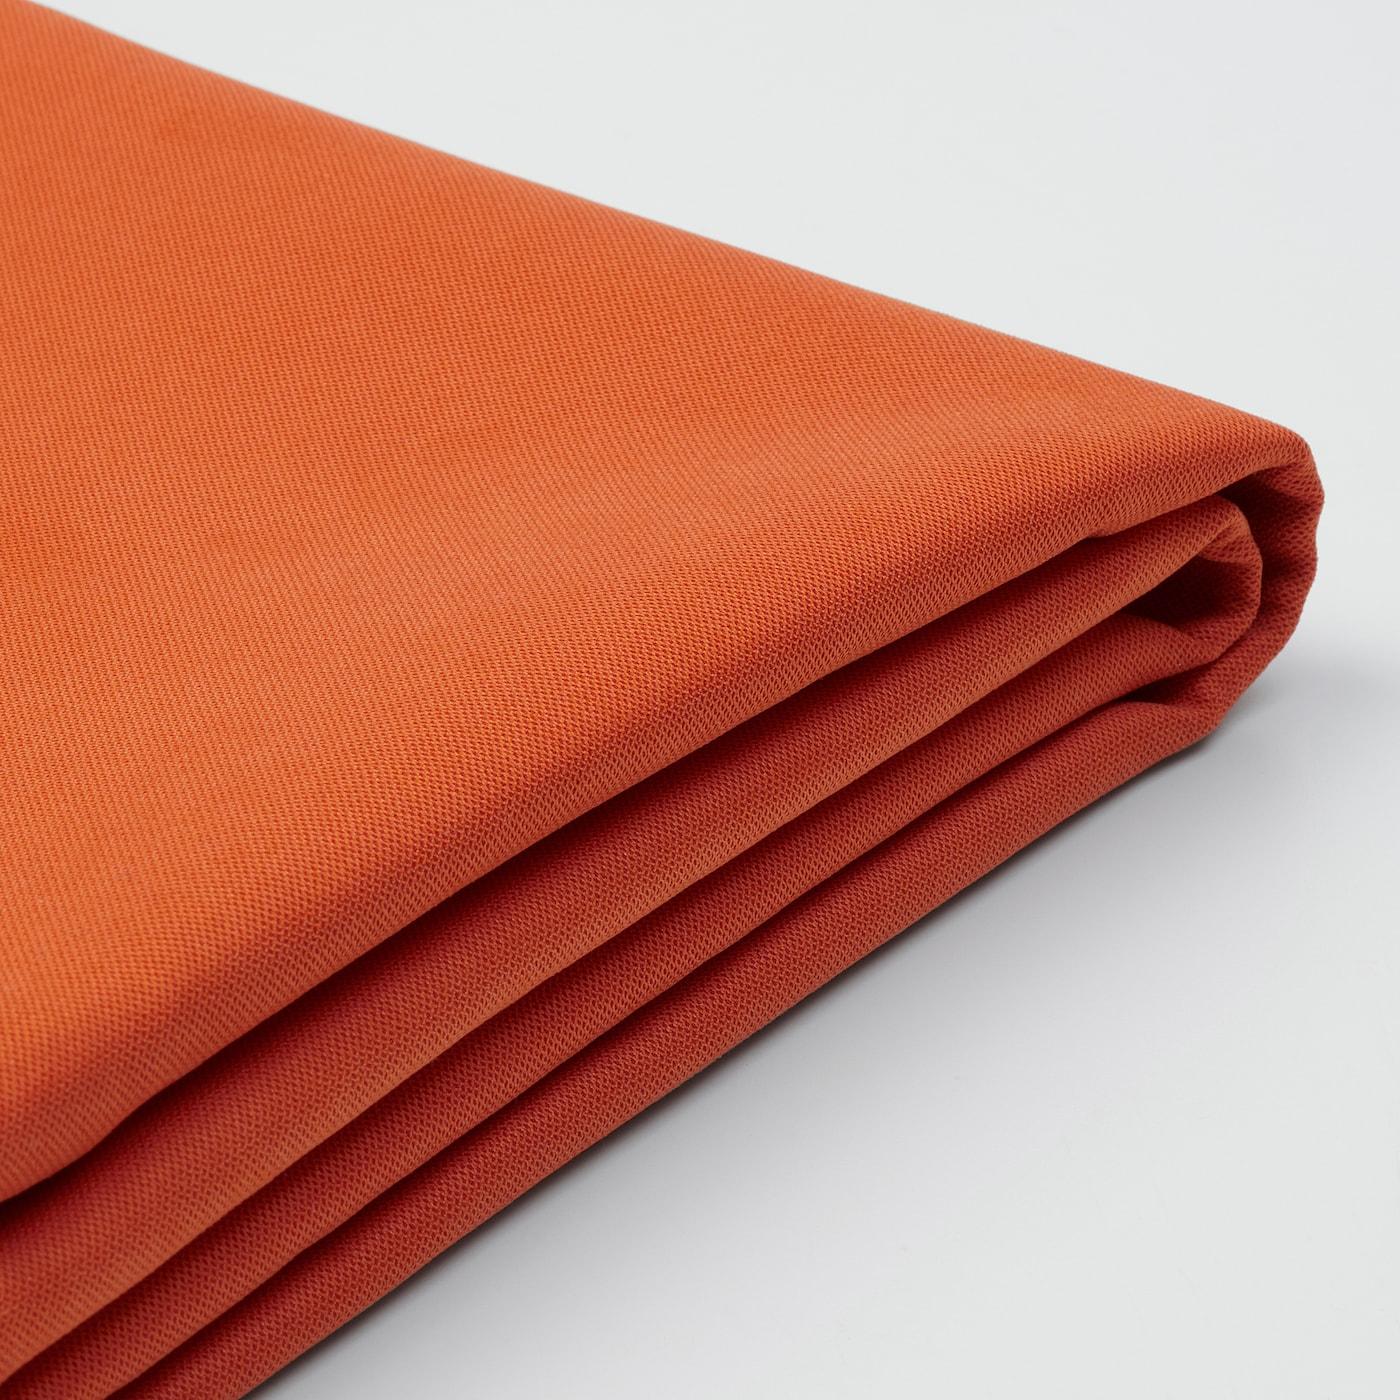 SÖDERHAMN Bezug Hocker - Samsta orange - IKEA Schweiz